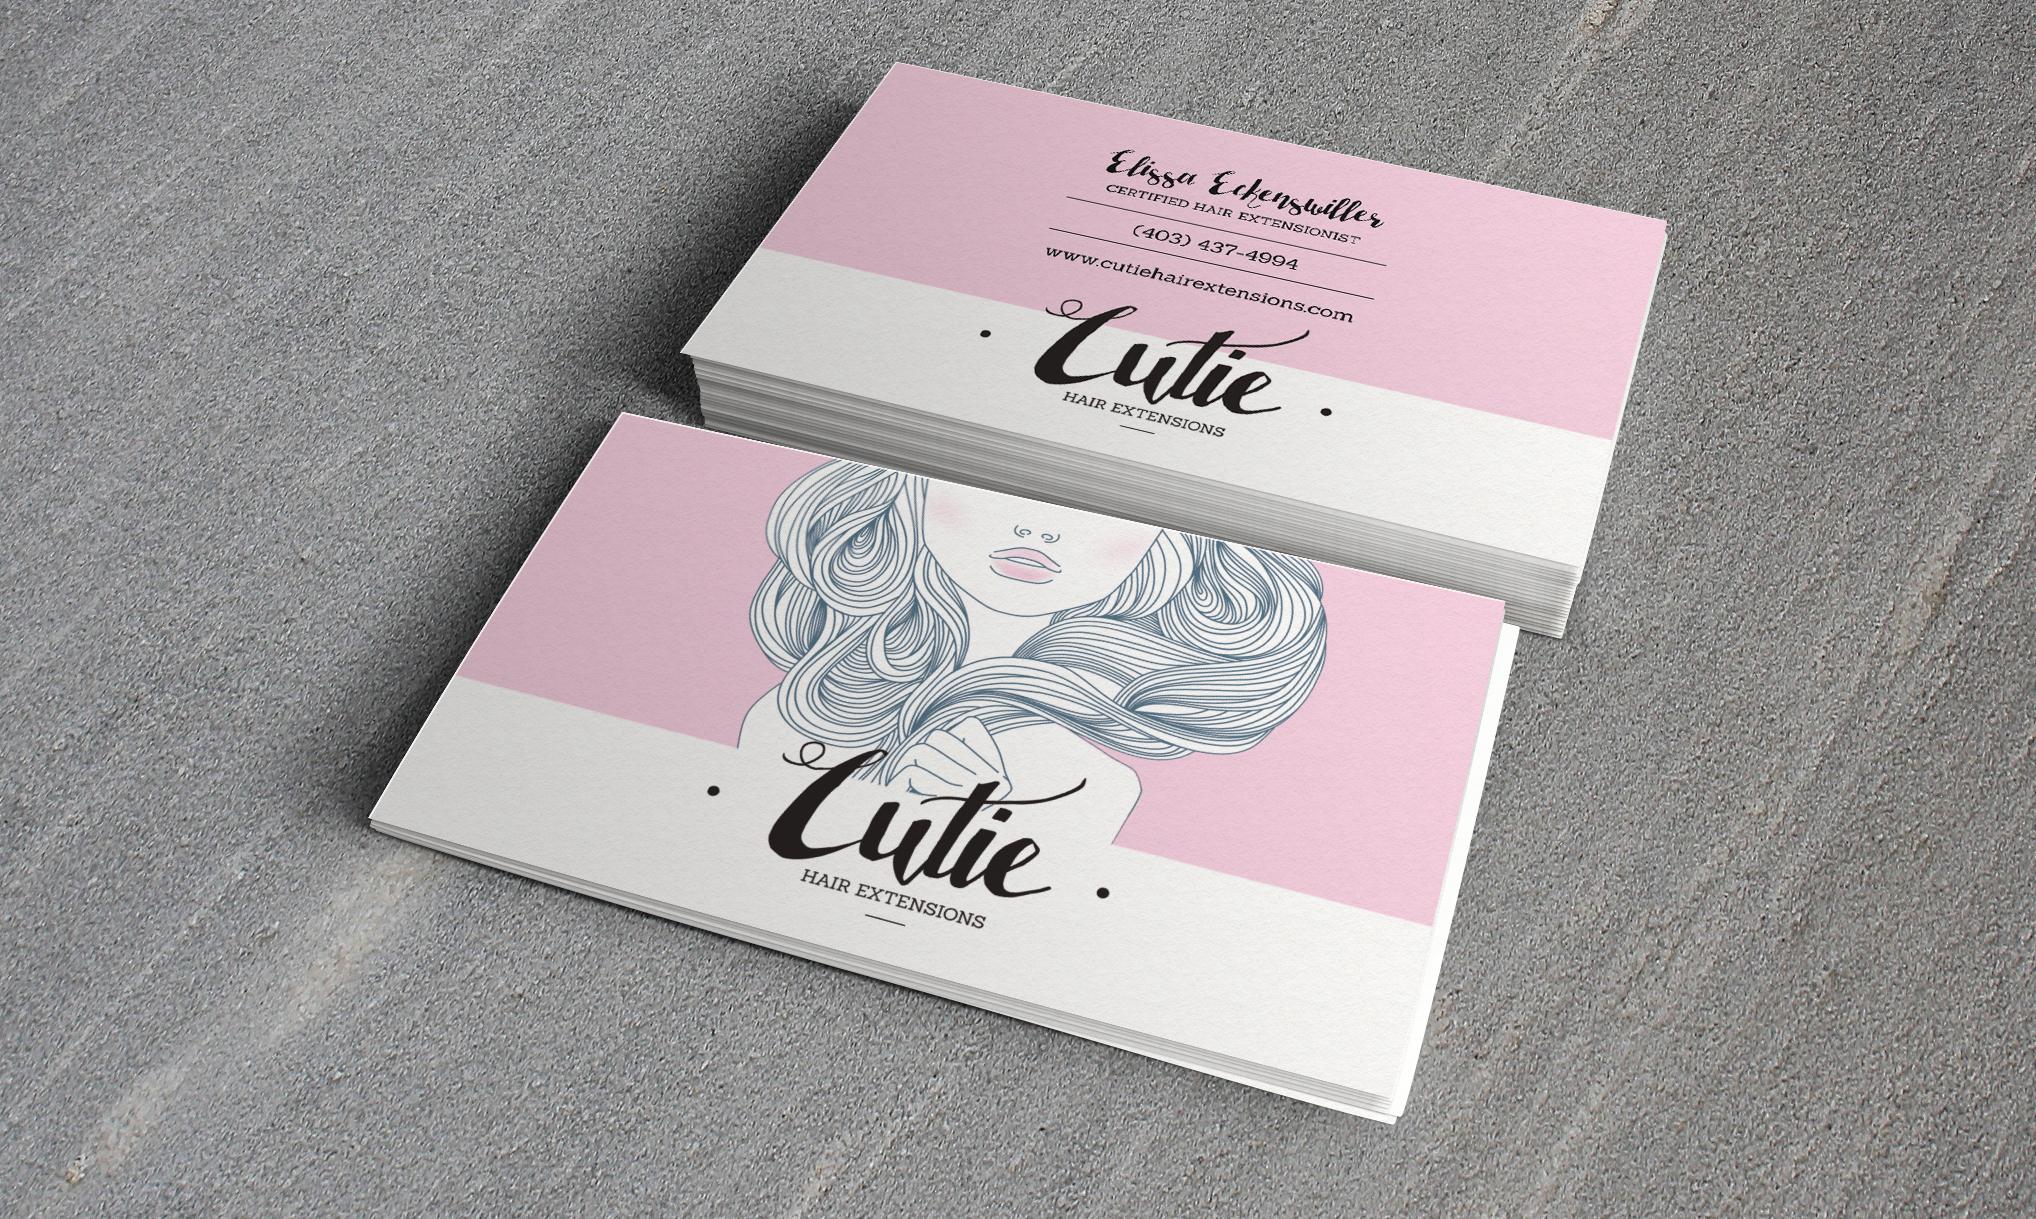 Cutie Hair Extensions Card Portfolio Mockup2